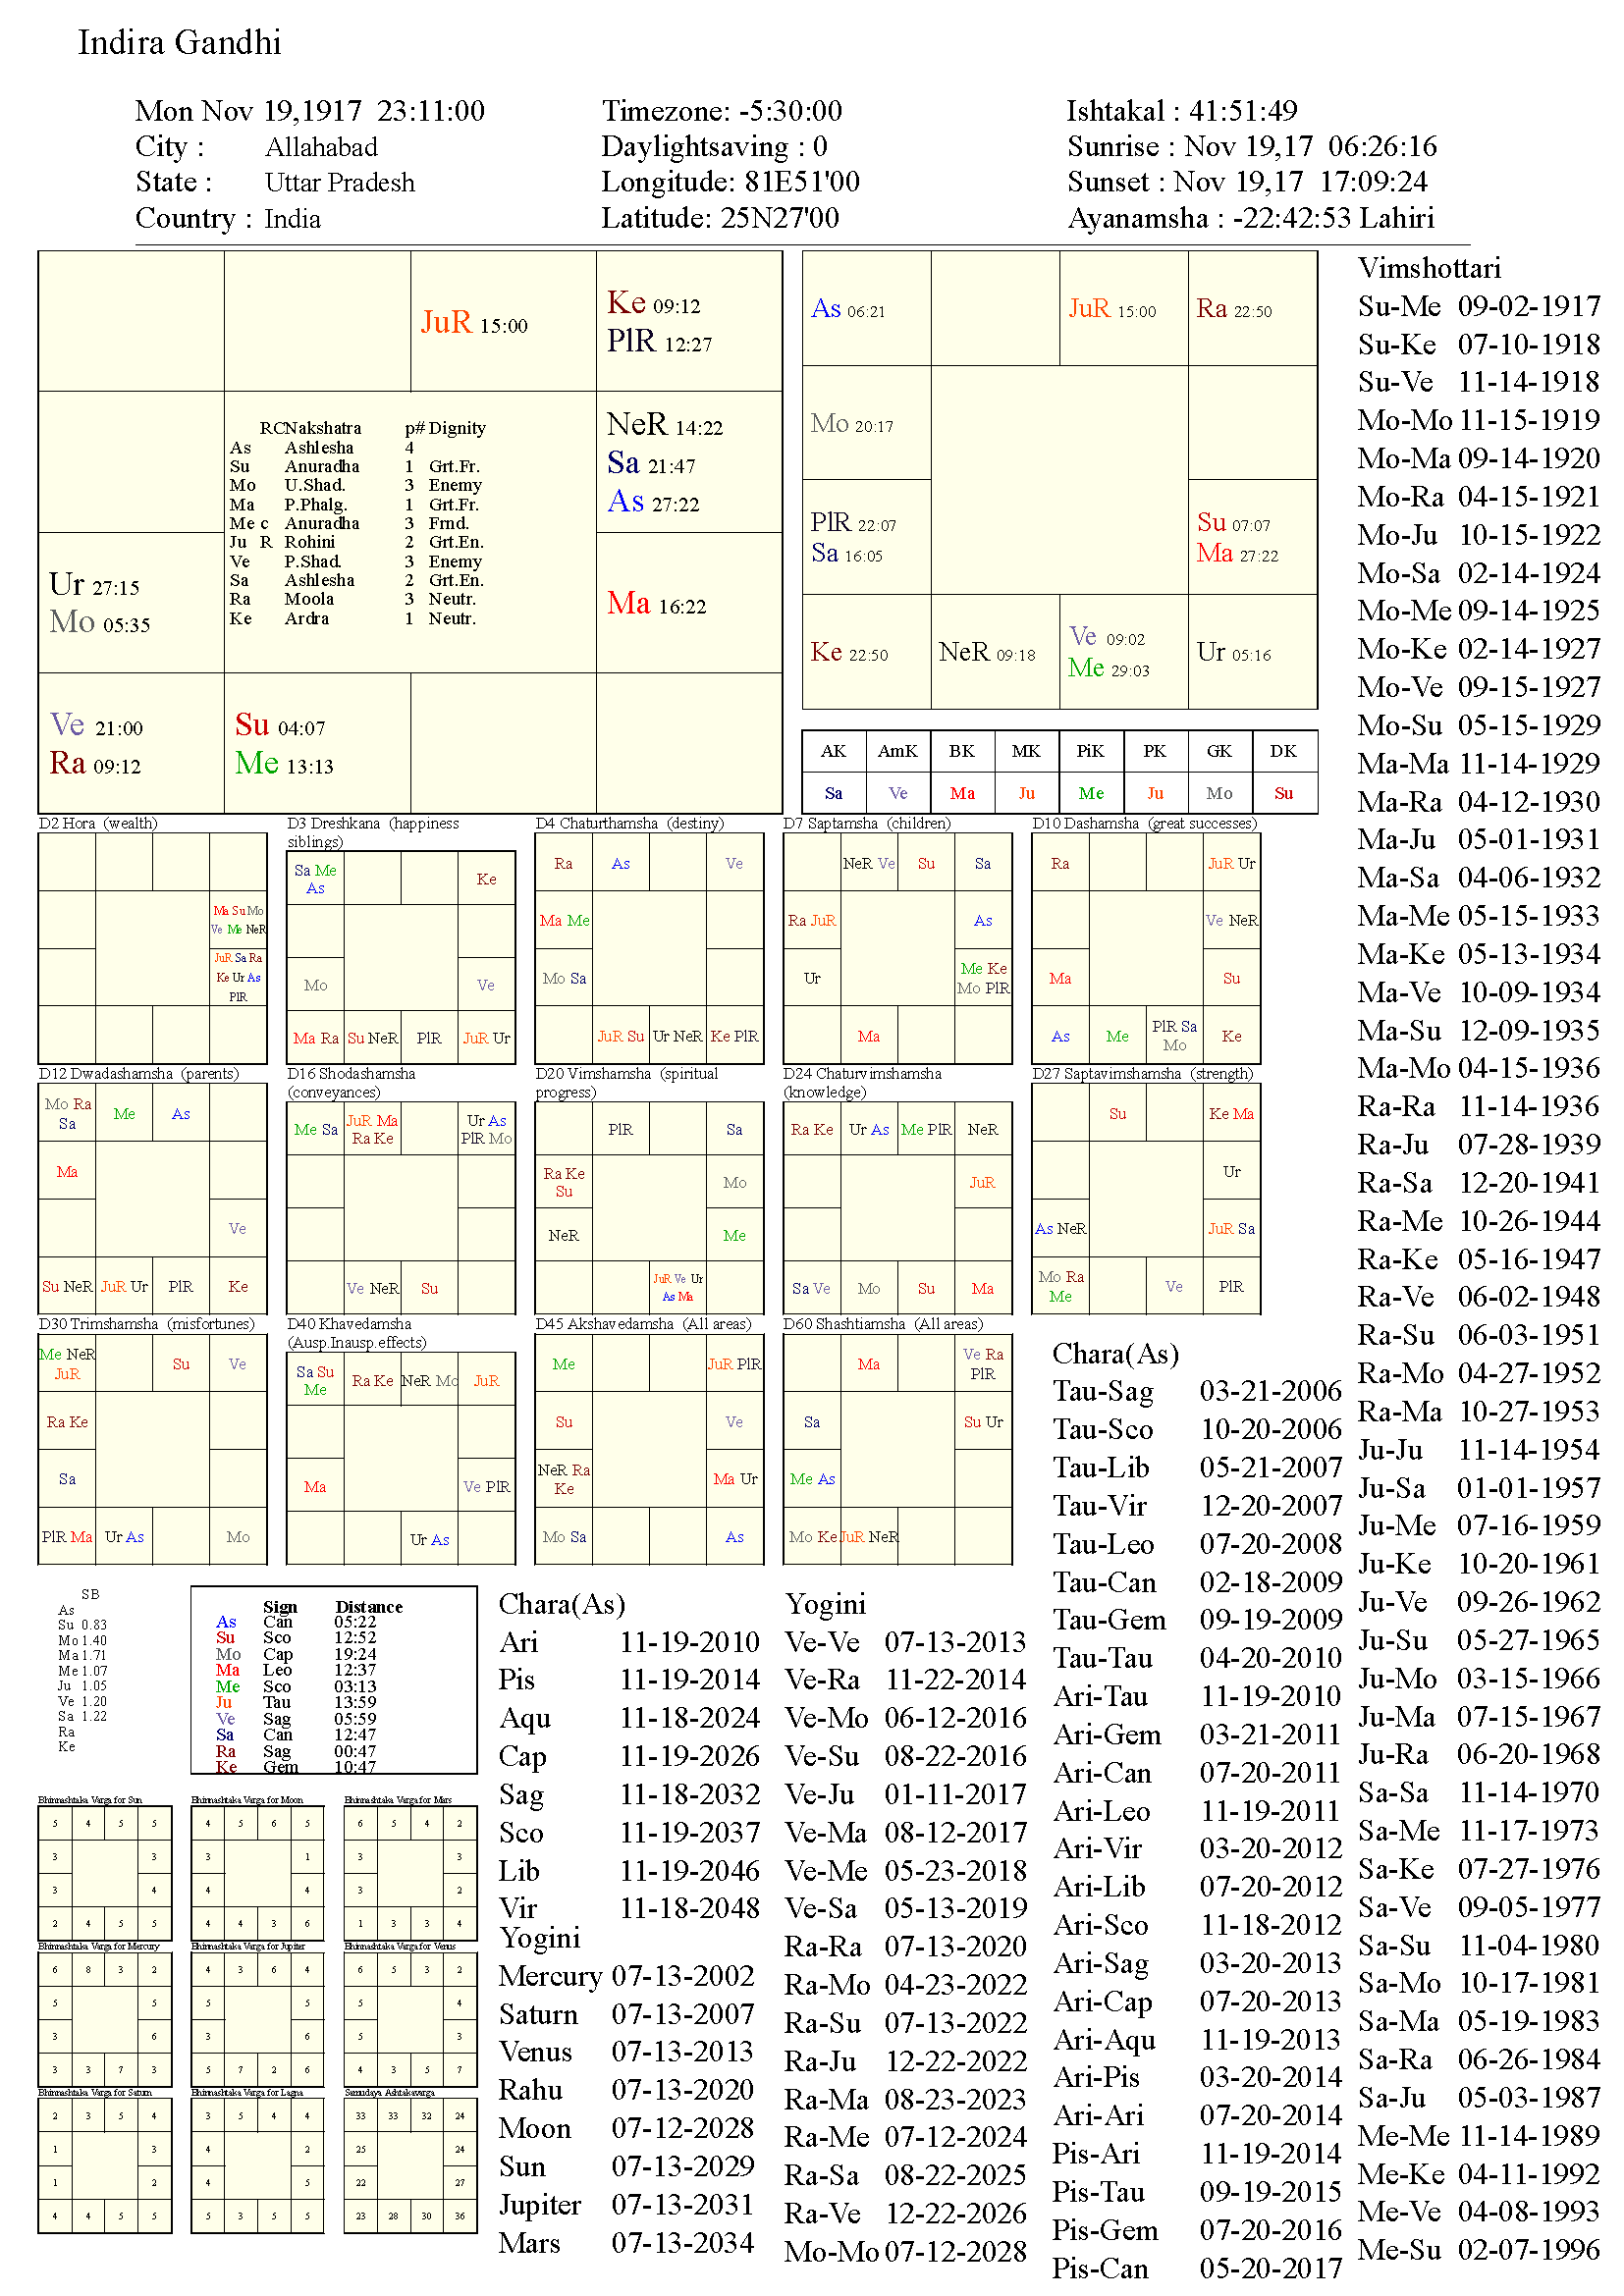 indiragandhi_chart